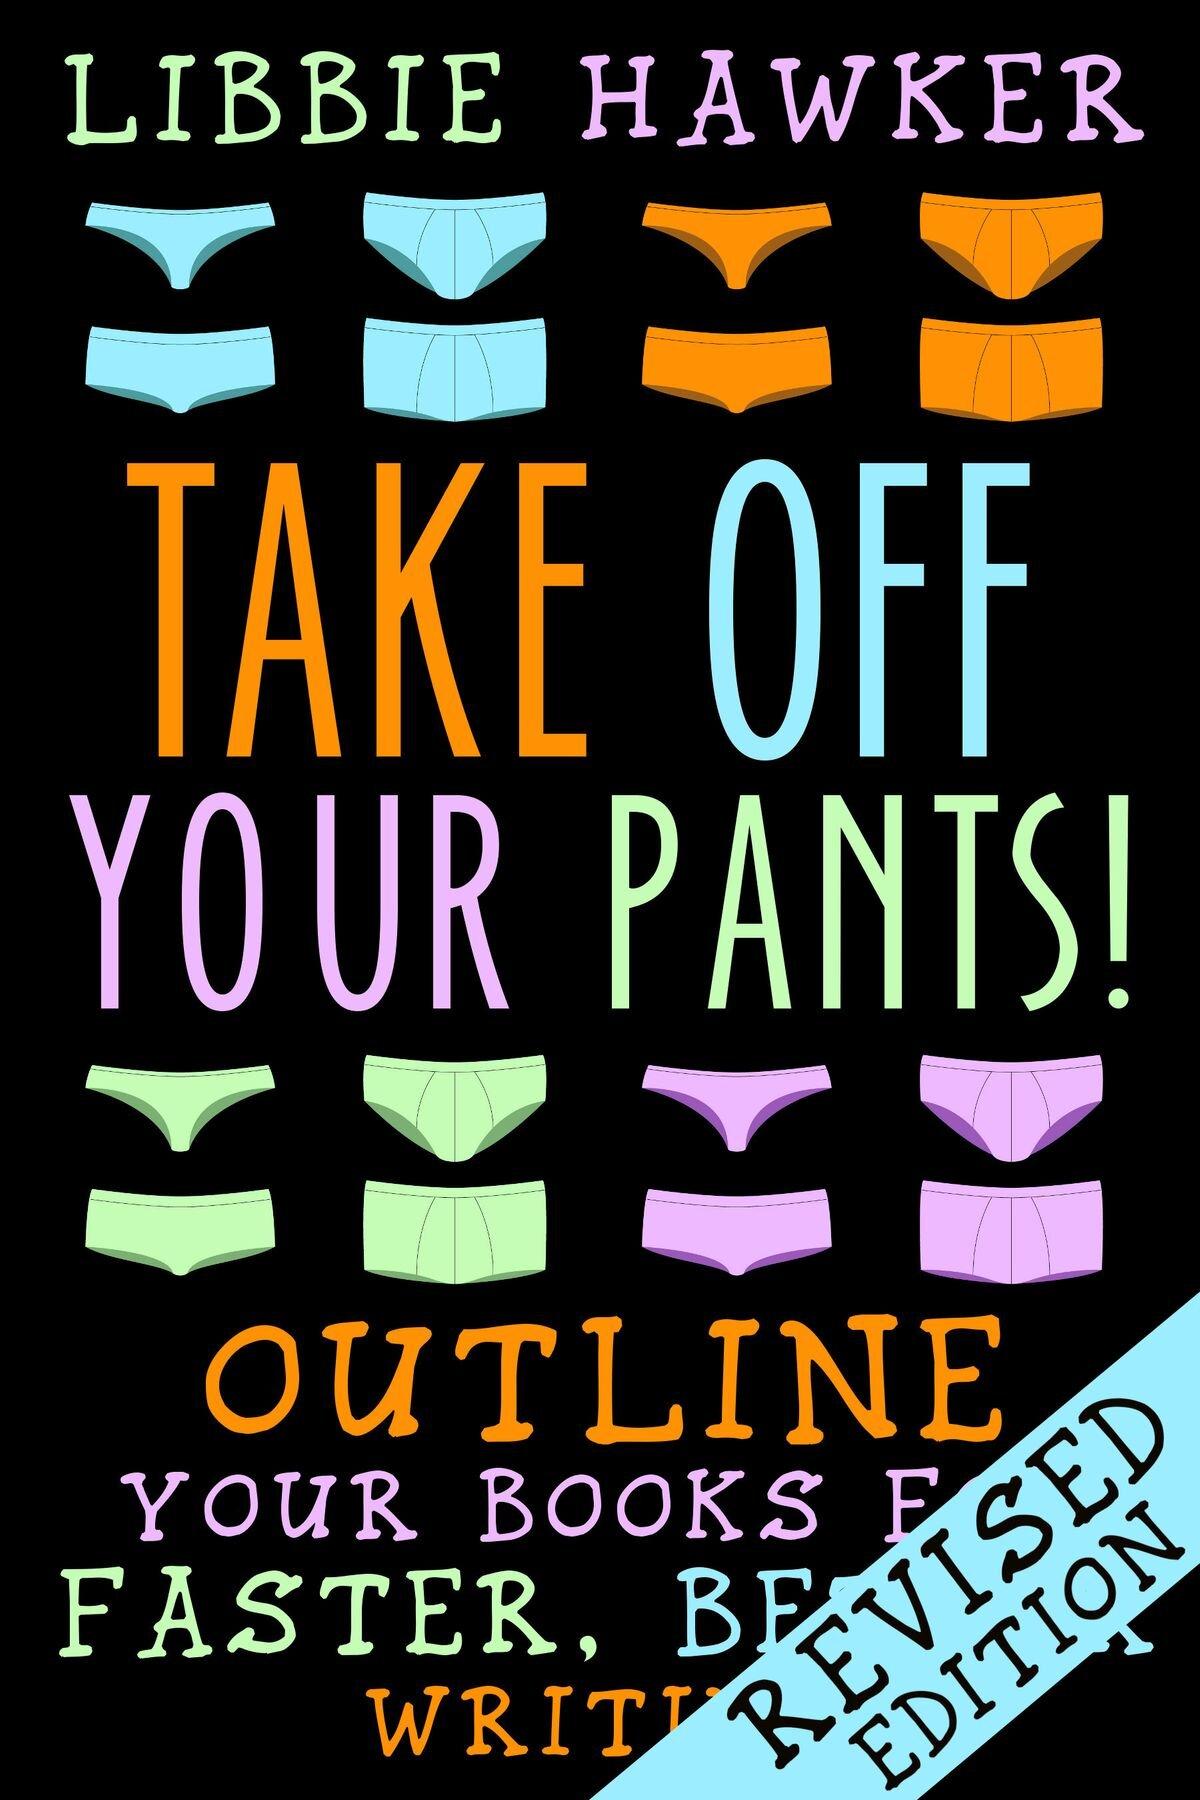 take-off-your-pants.jpg